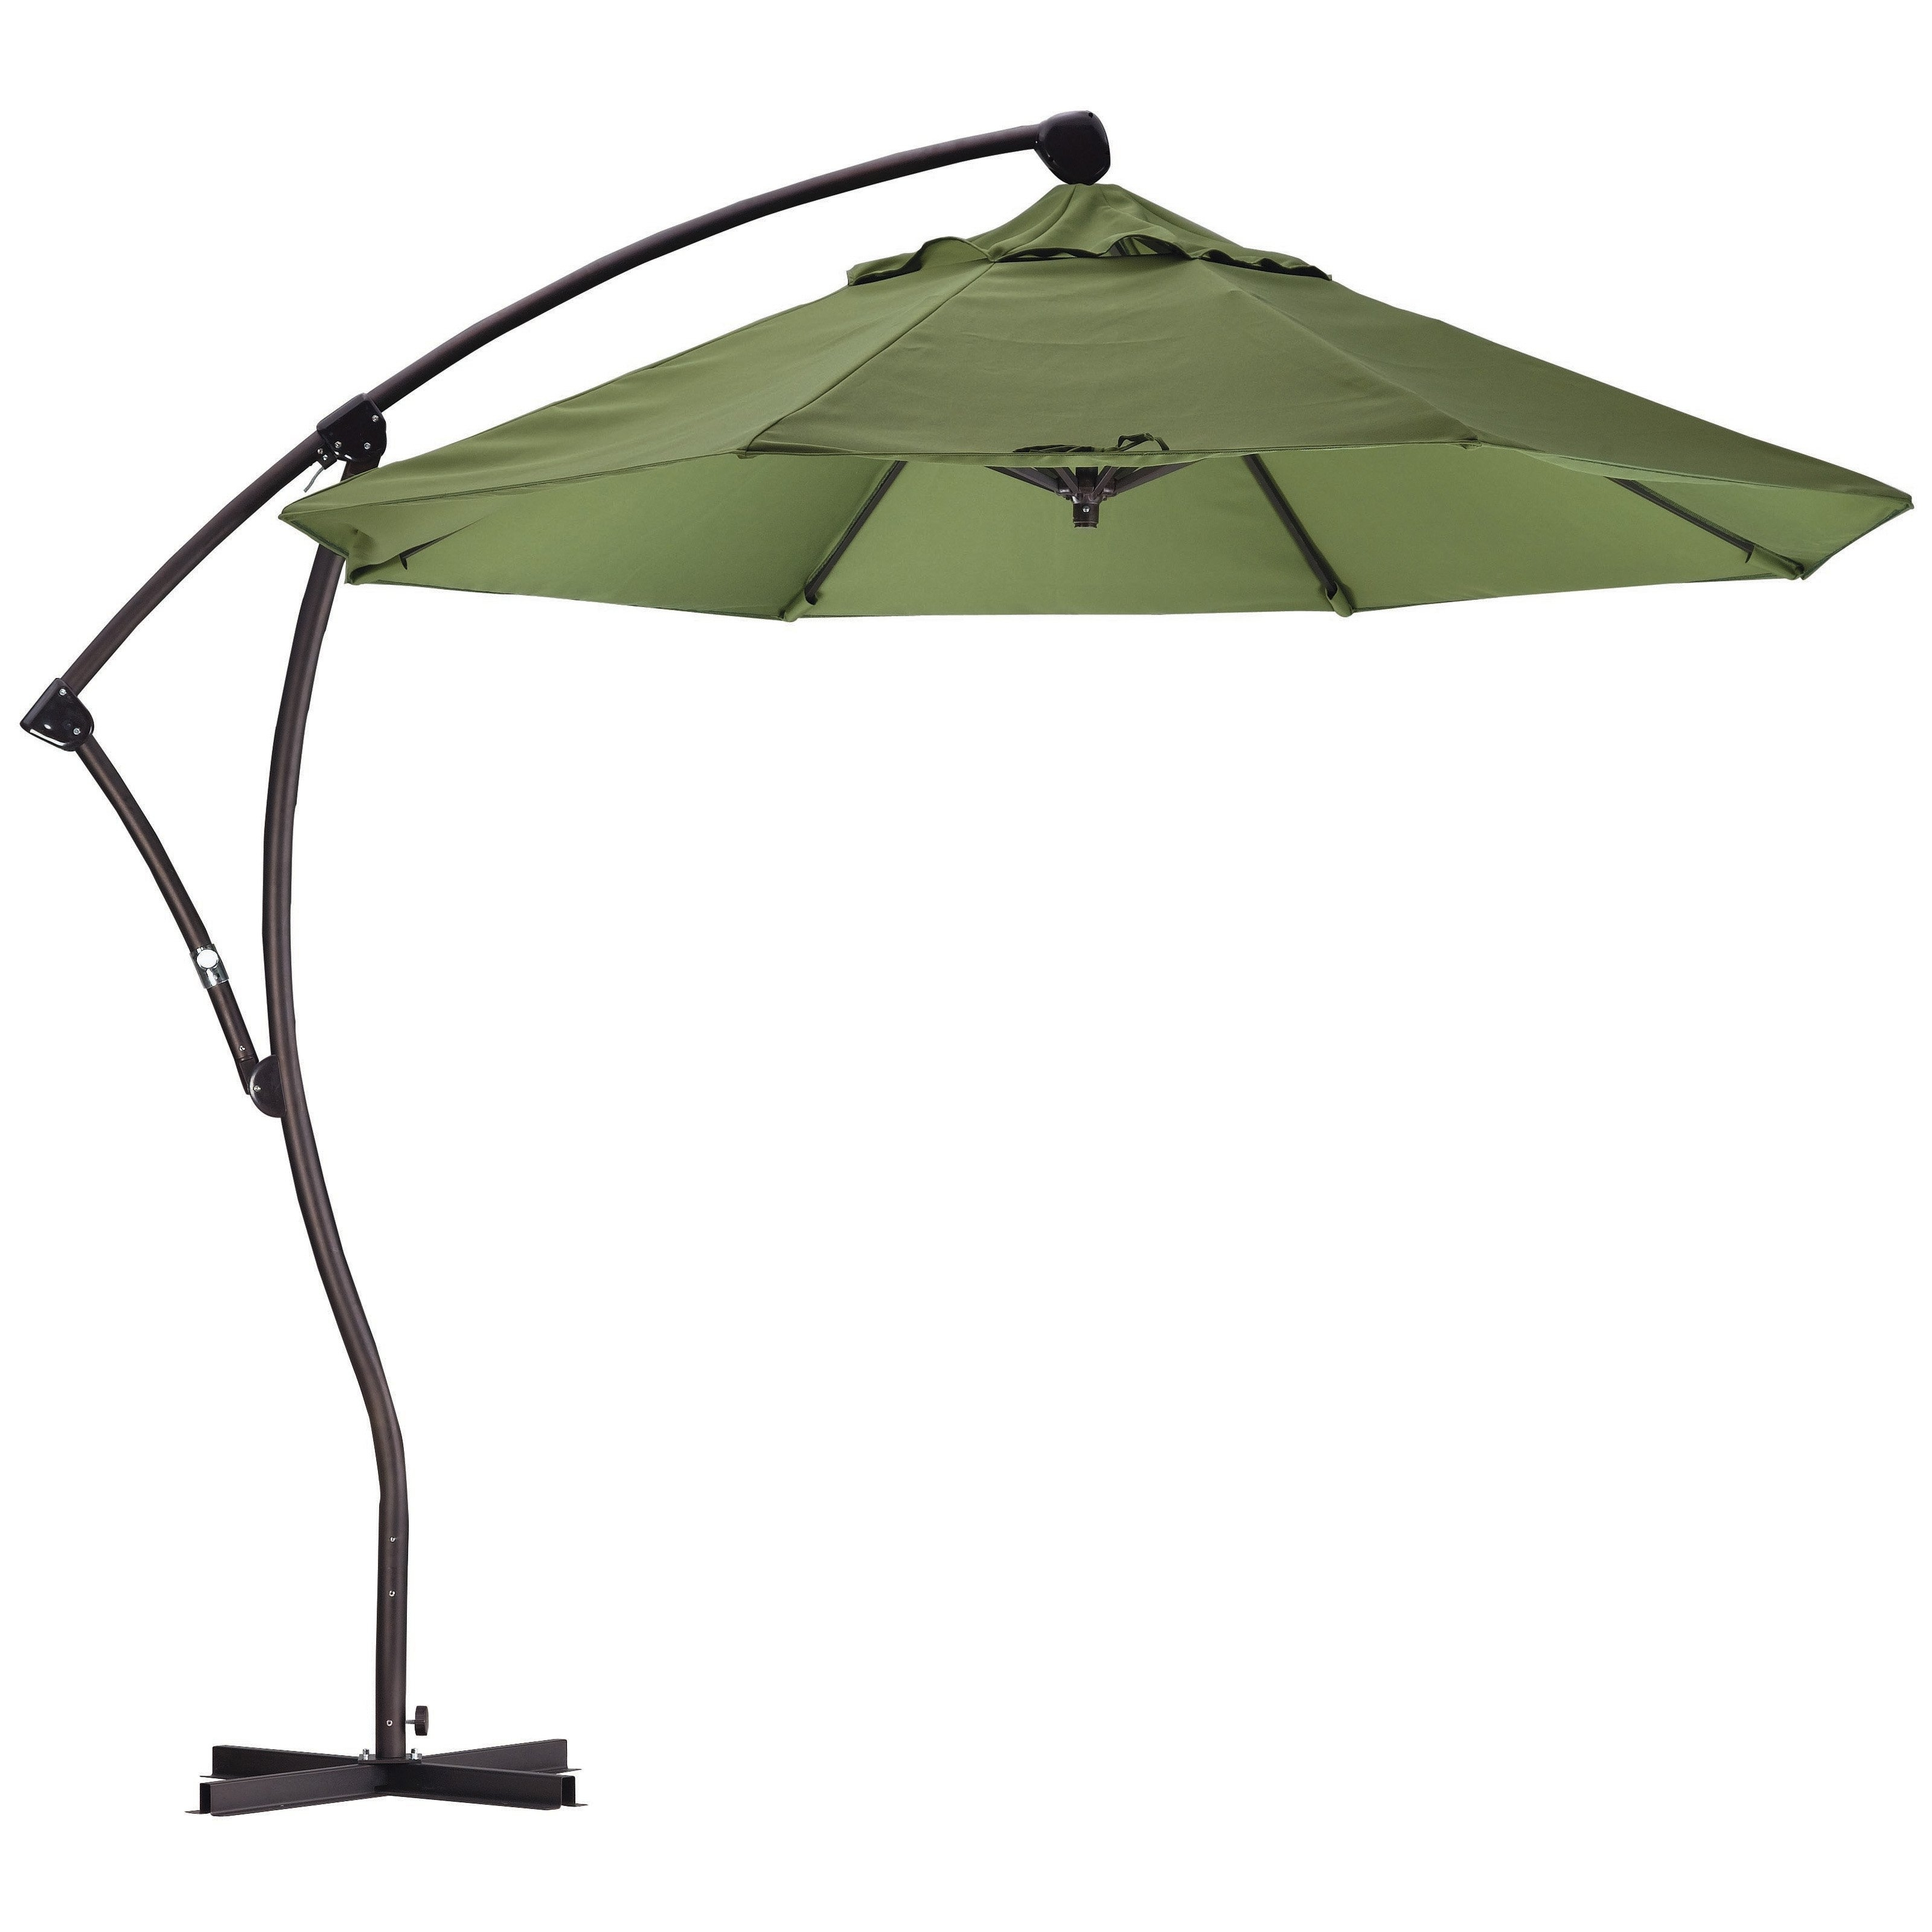 Fashionable Cute Offset Patio Umbrella Canvas Aluminum Mezzo Mg Offset Patio With Regard To Free Standing Patio Umbrellas (View 7 of 20)